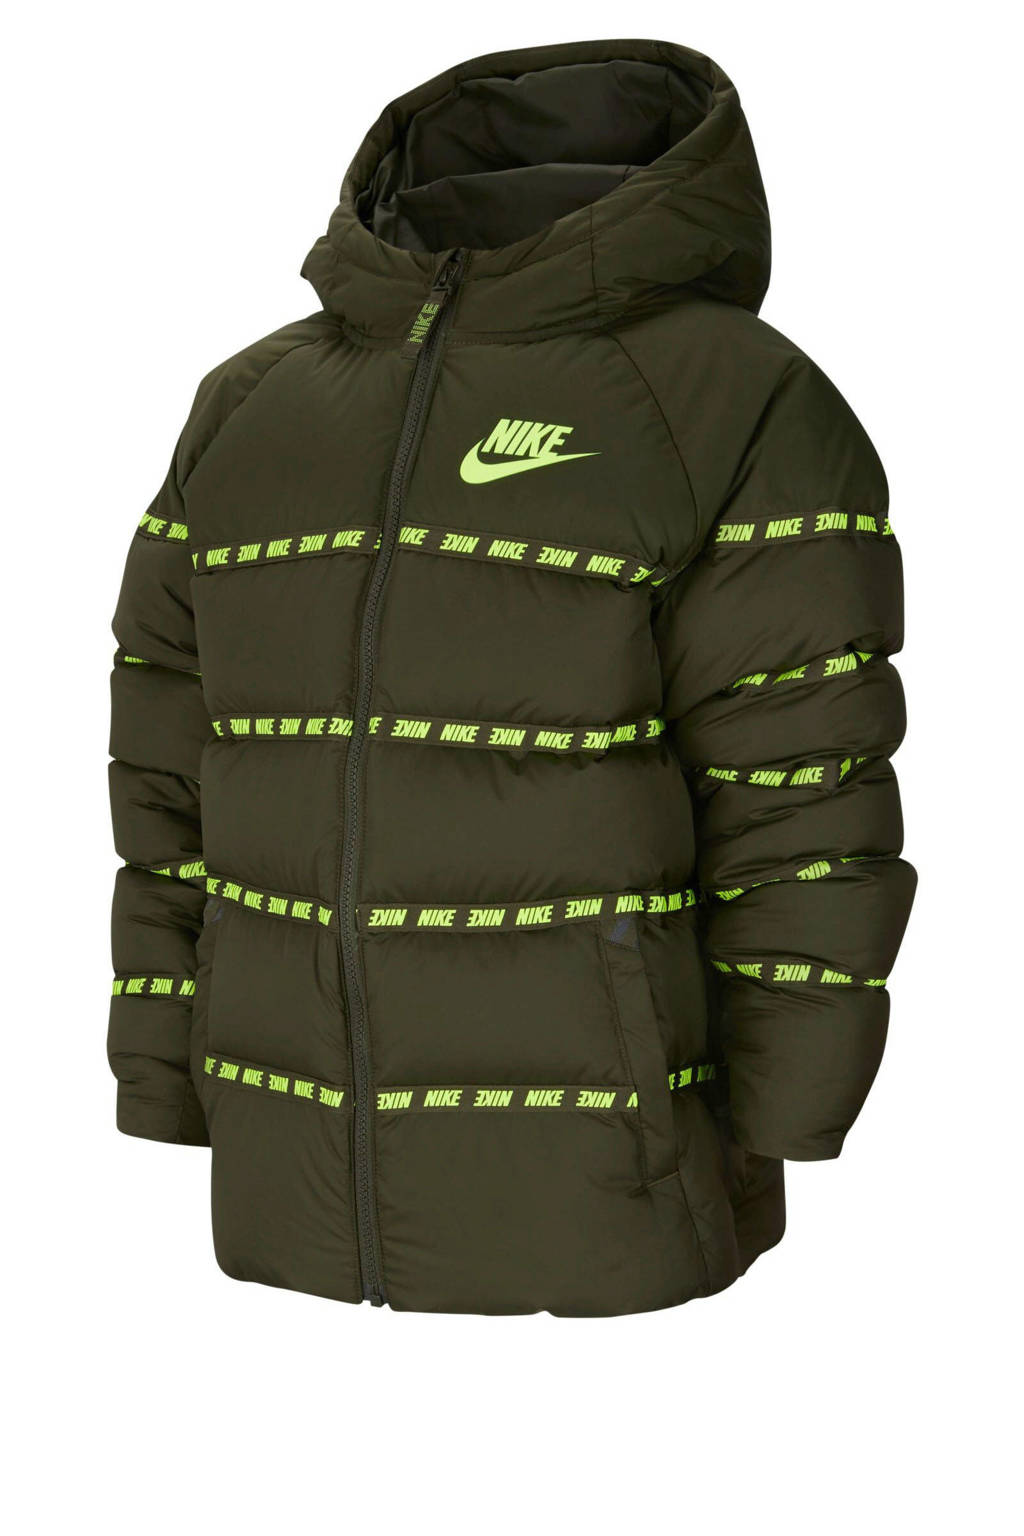 Nike gewatteerde winterjas kaki/limegroen, Kaki/limegroen